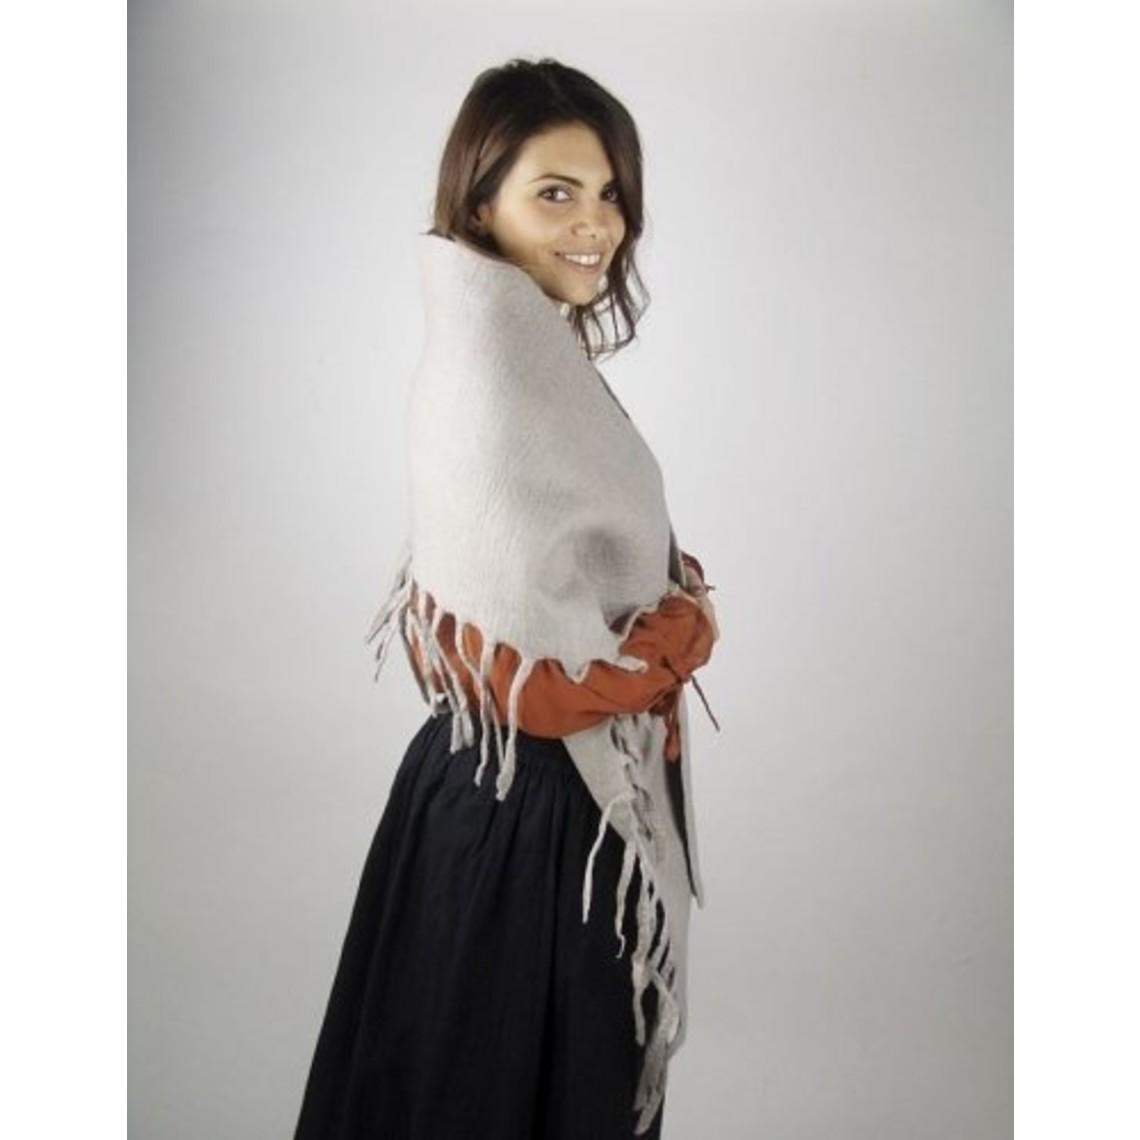 Leonardo Carbone Chal de lana del siglo XVII